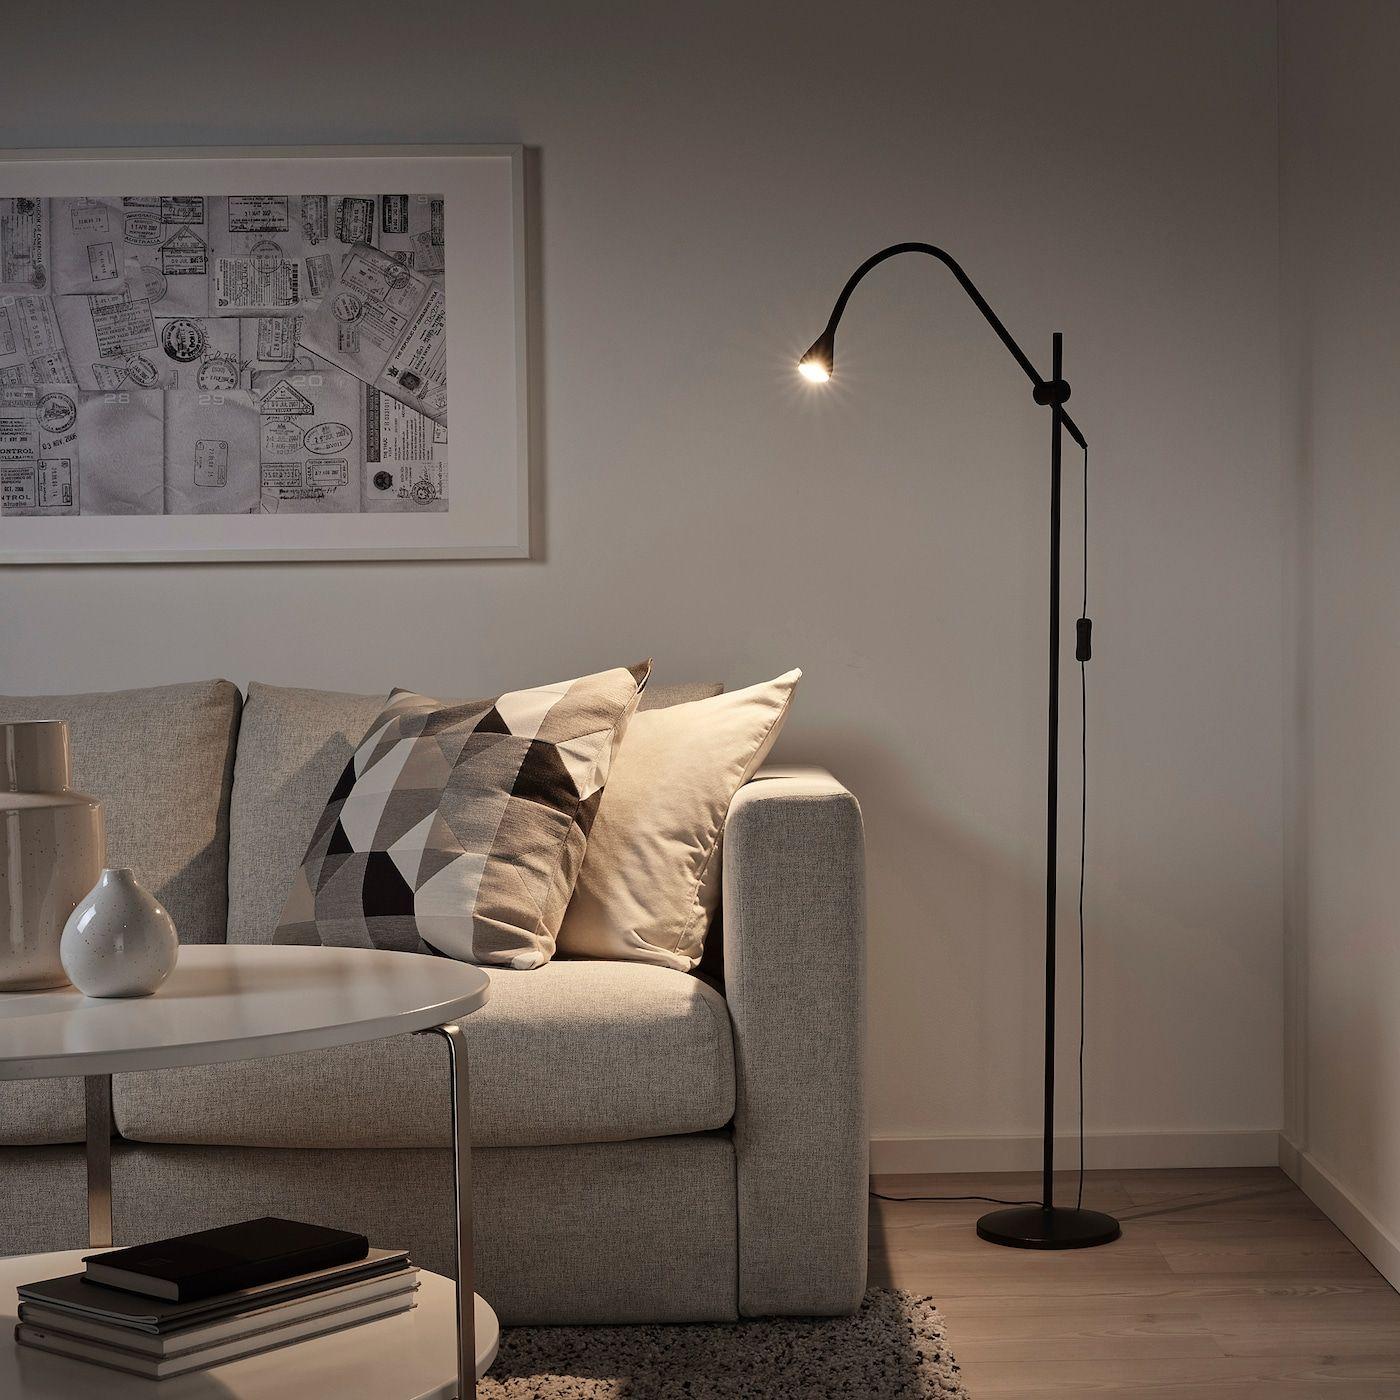 Navlinge Stand Leseleuchte Led Schwarz Ikea Deutschland Led Stehleuchte Led Leuchtmittel Und Led Lampe